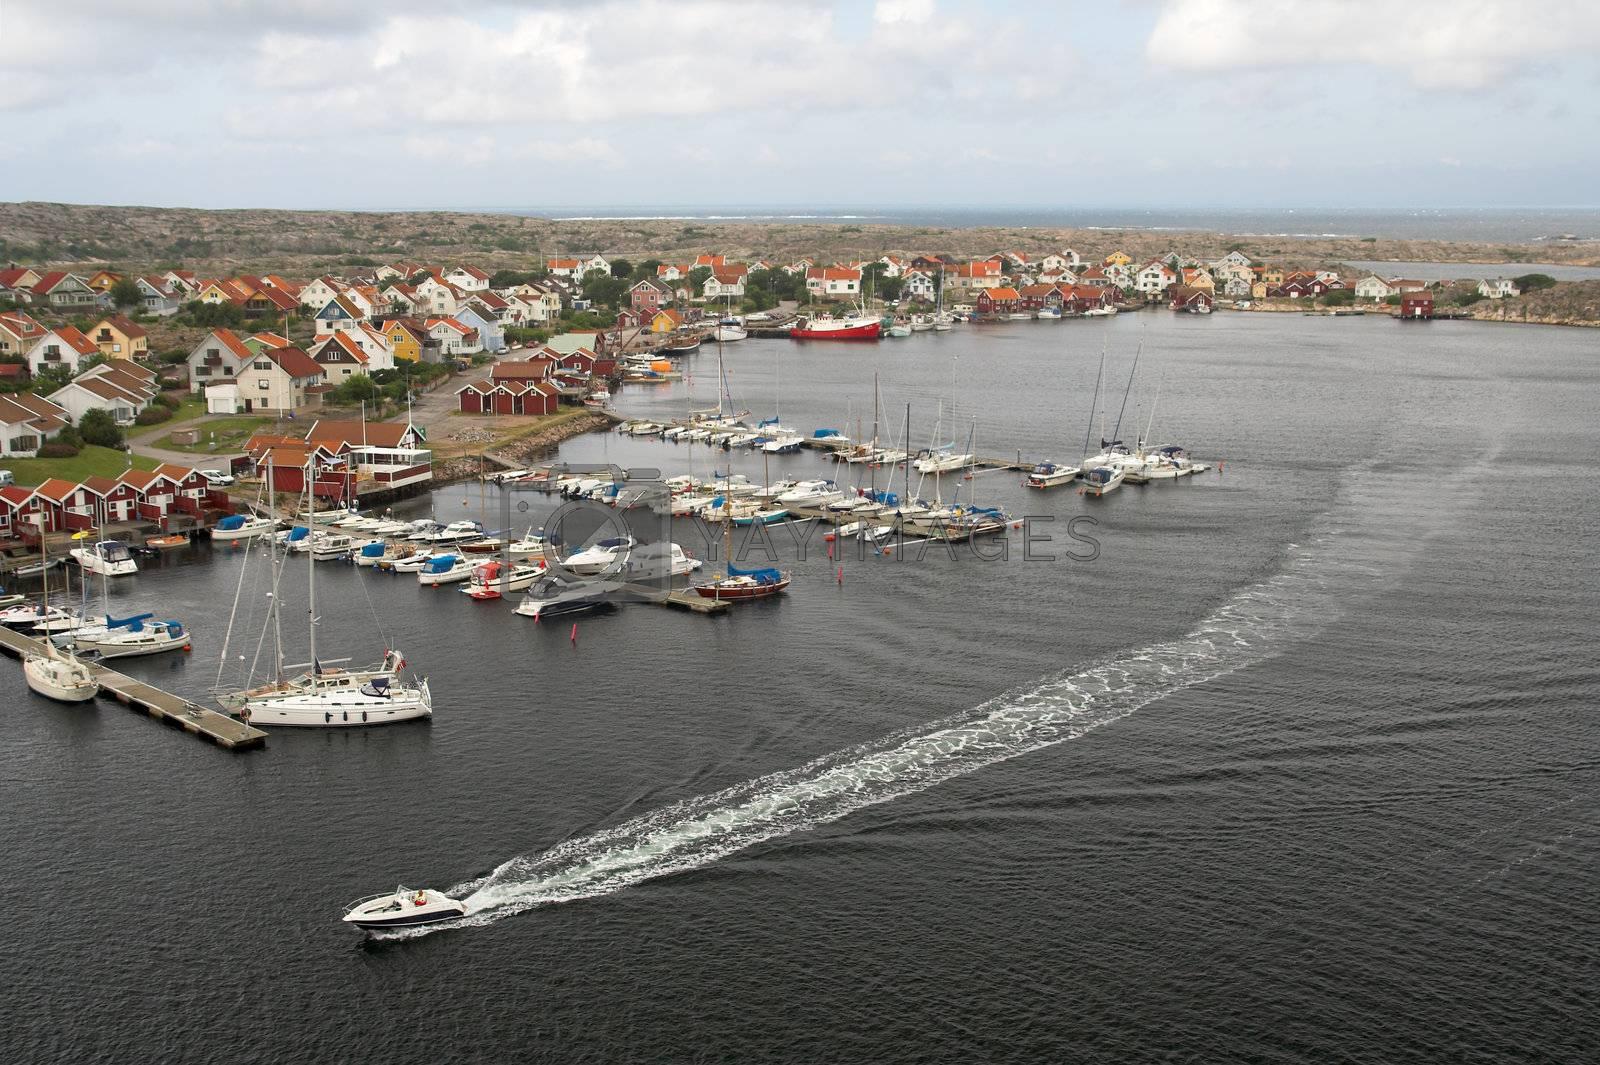 Yacht passing along the marina by MikLav